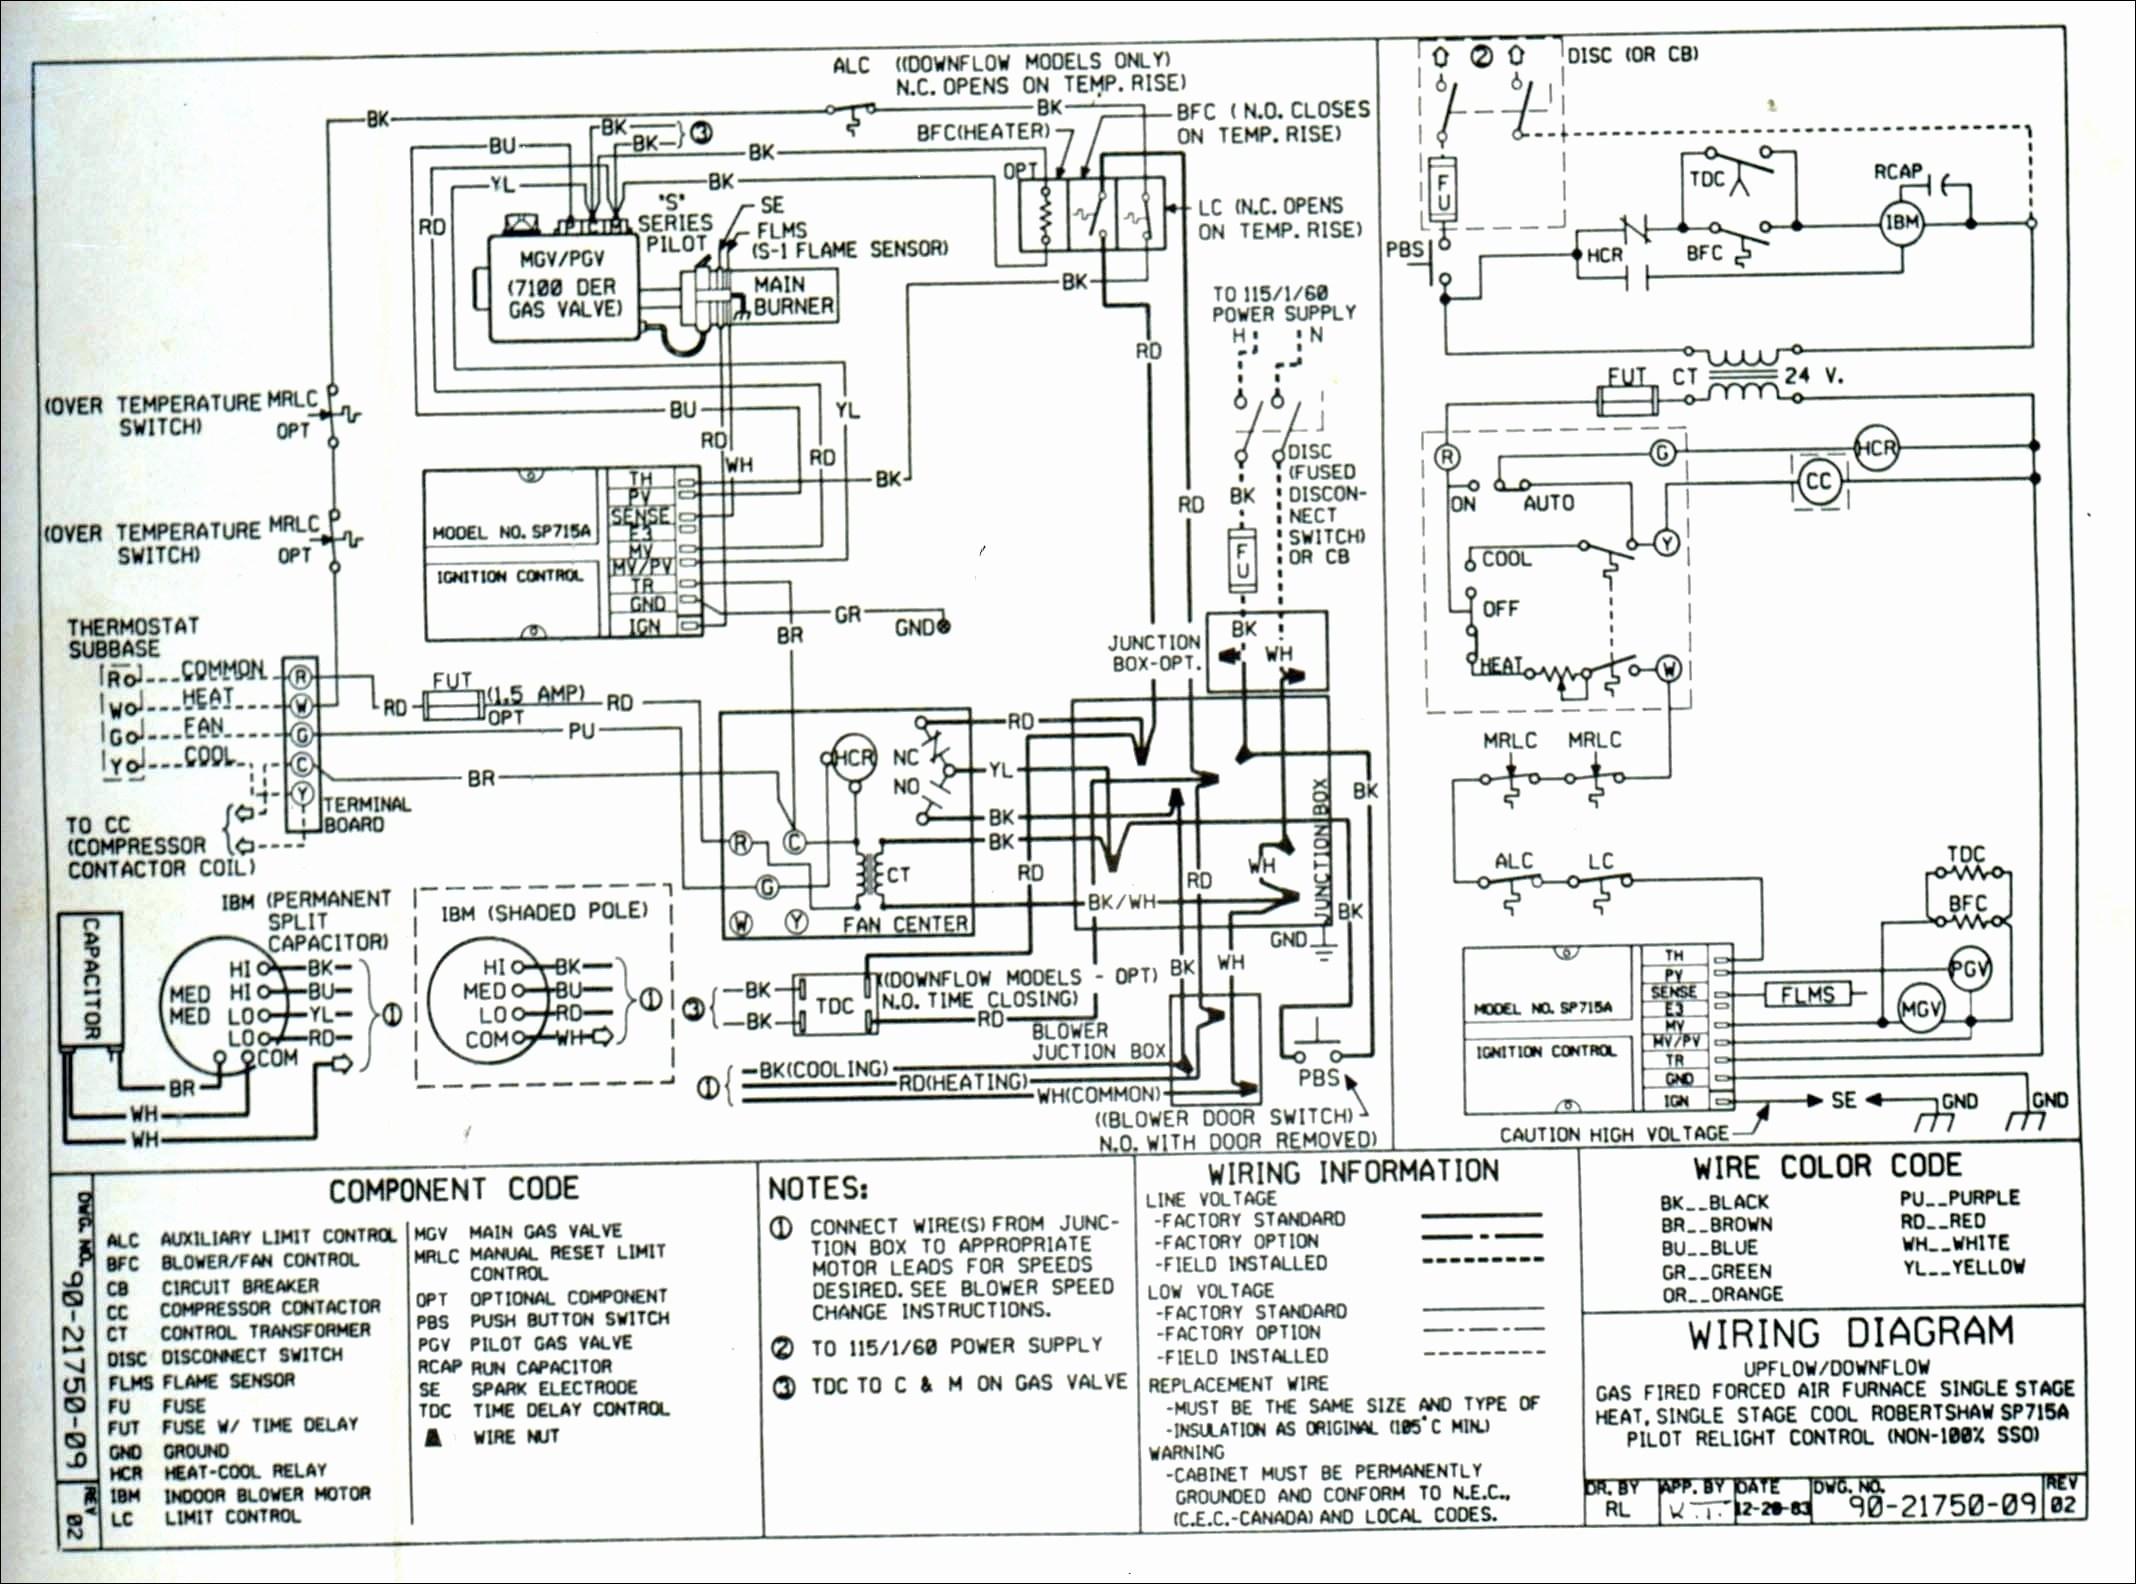 Metra Wiring Harness Diagram 70 1817 | Best Wiring Library - Metra 70-1761 Wiring Diagram